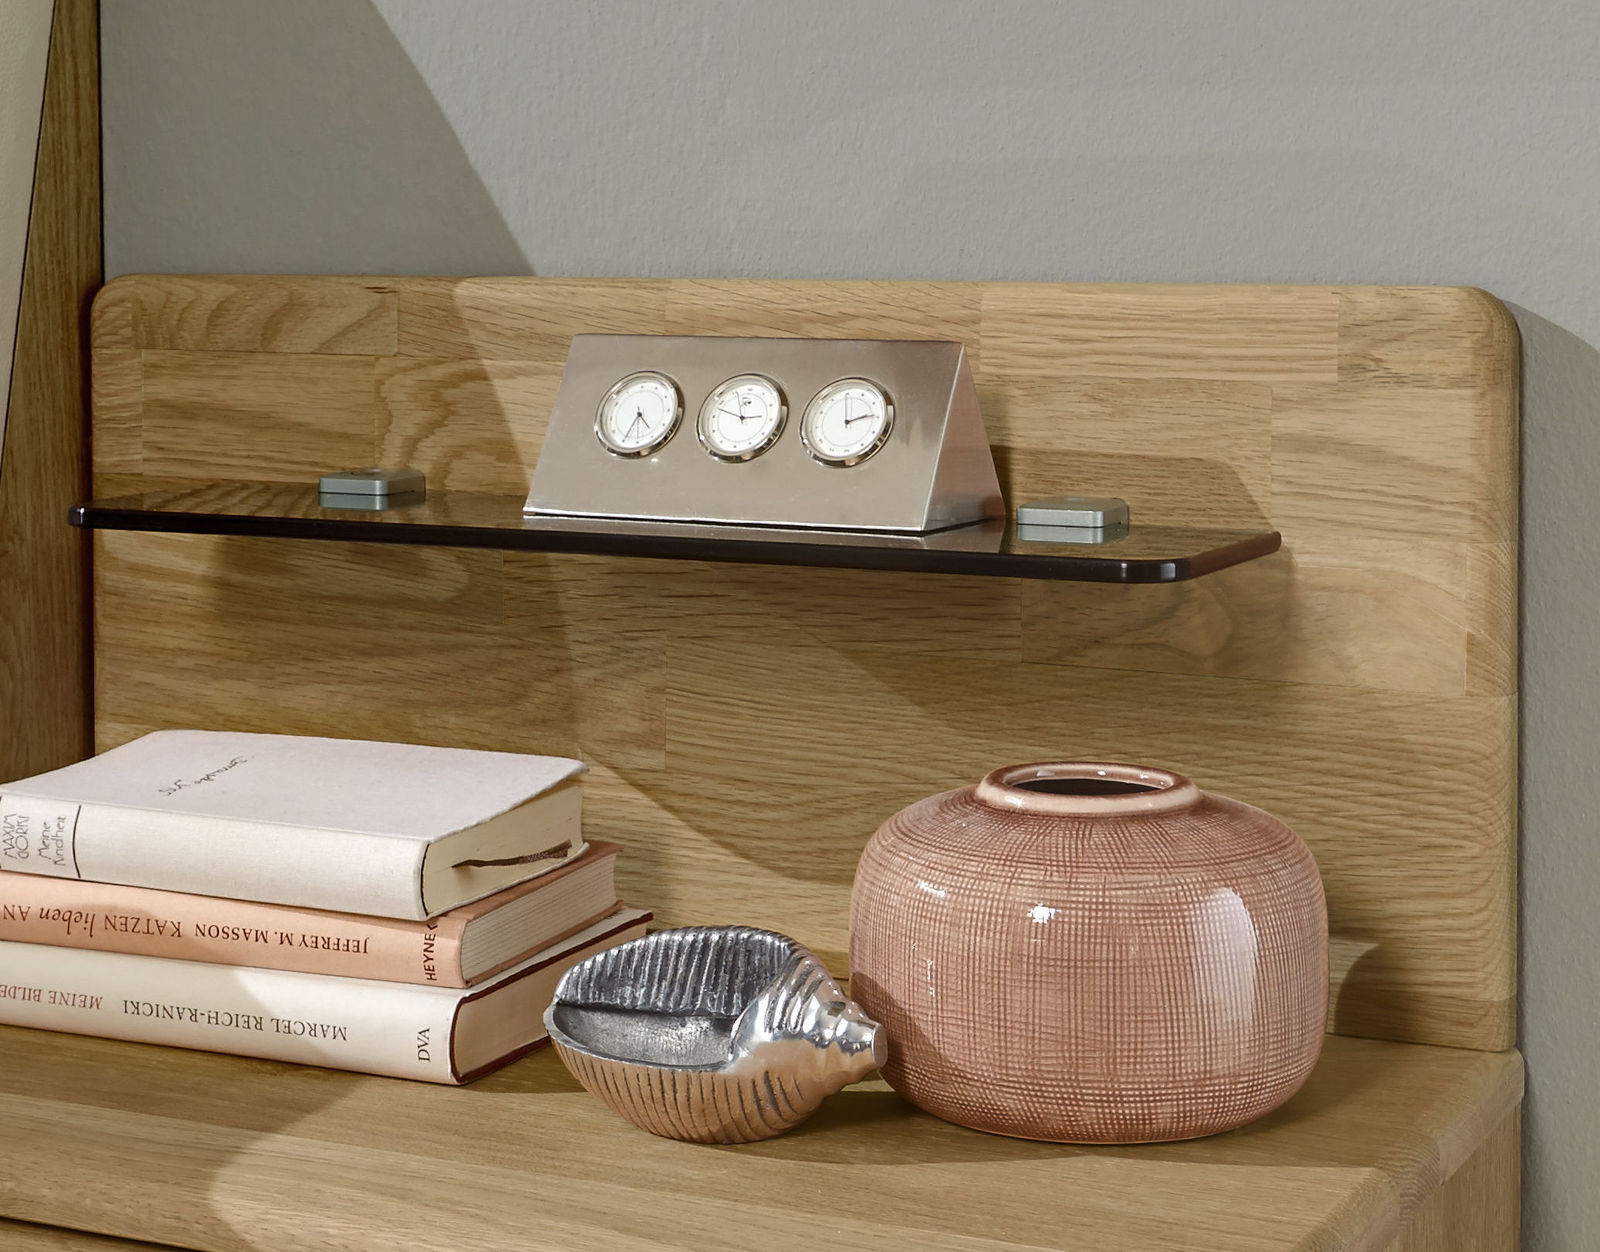 nachttisch mit led best led desktop rgb ndern fisch. Black Bedroom Furniture Sets. Home Design Ideas